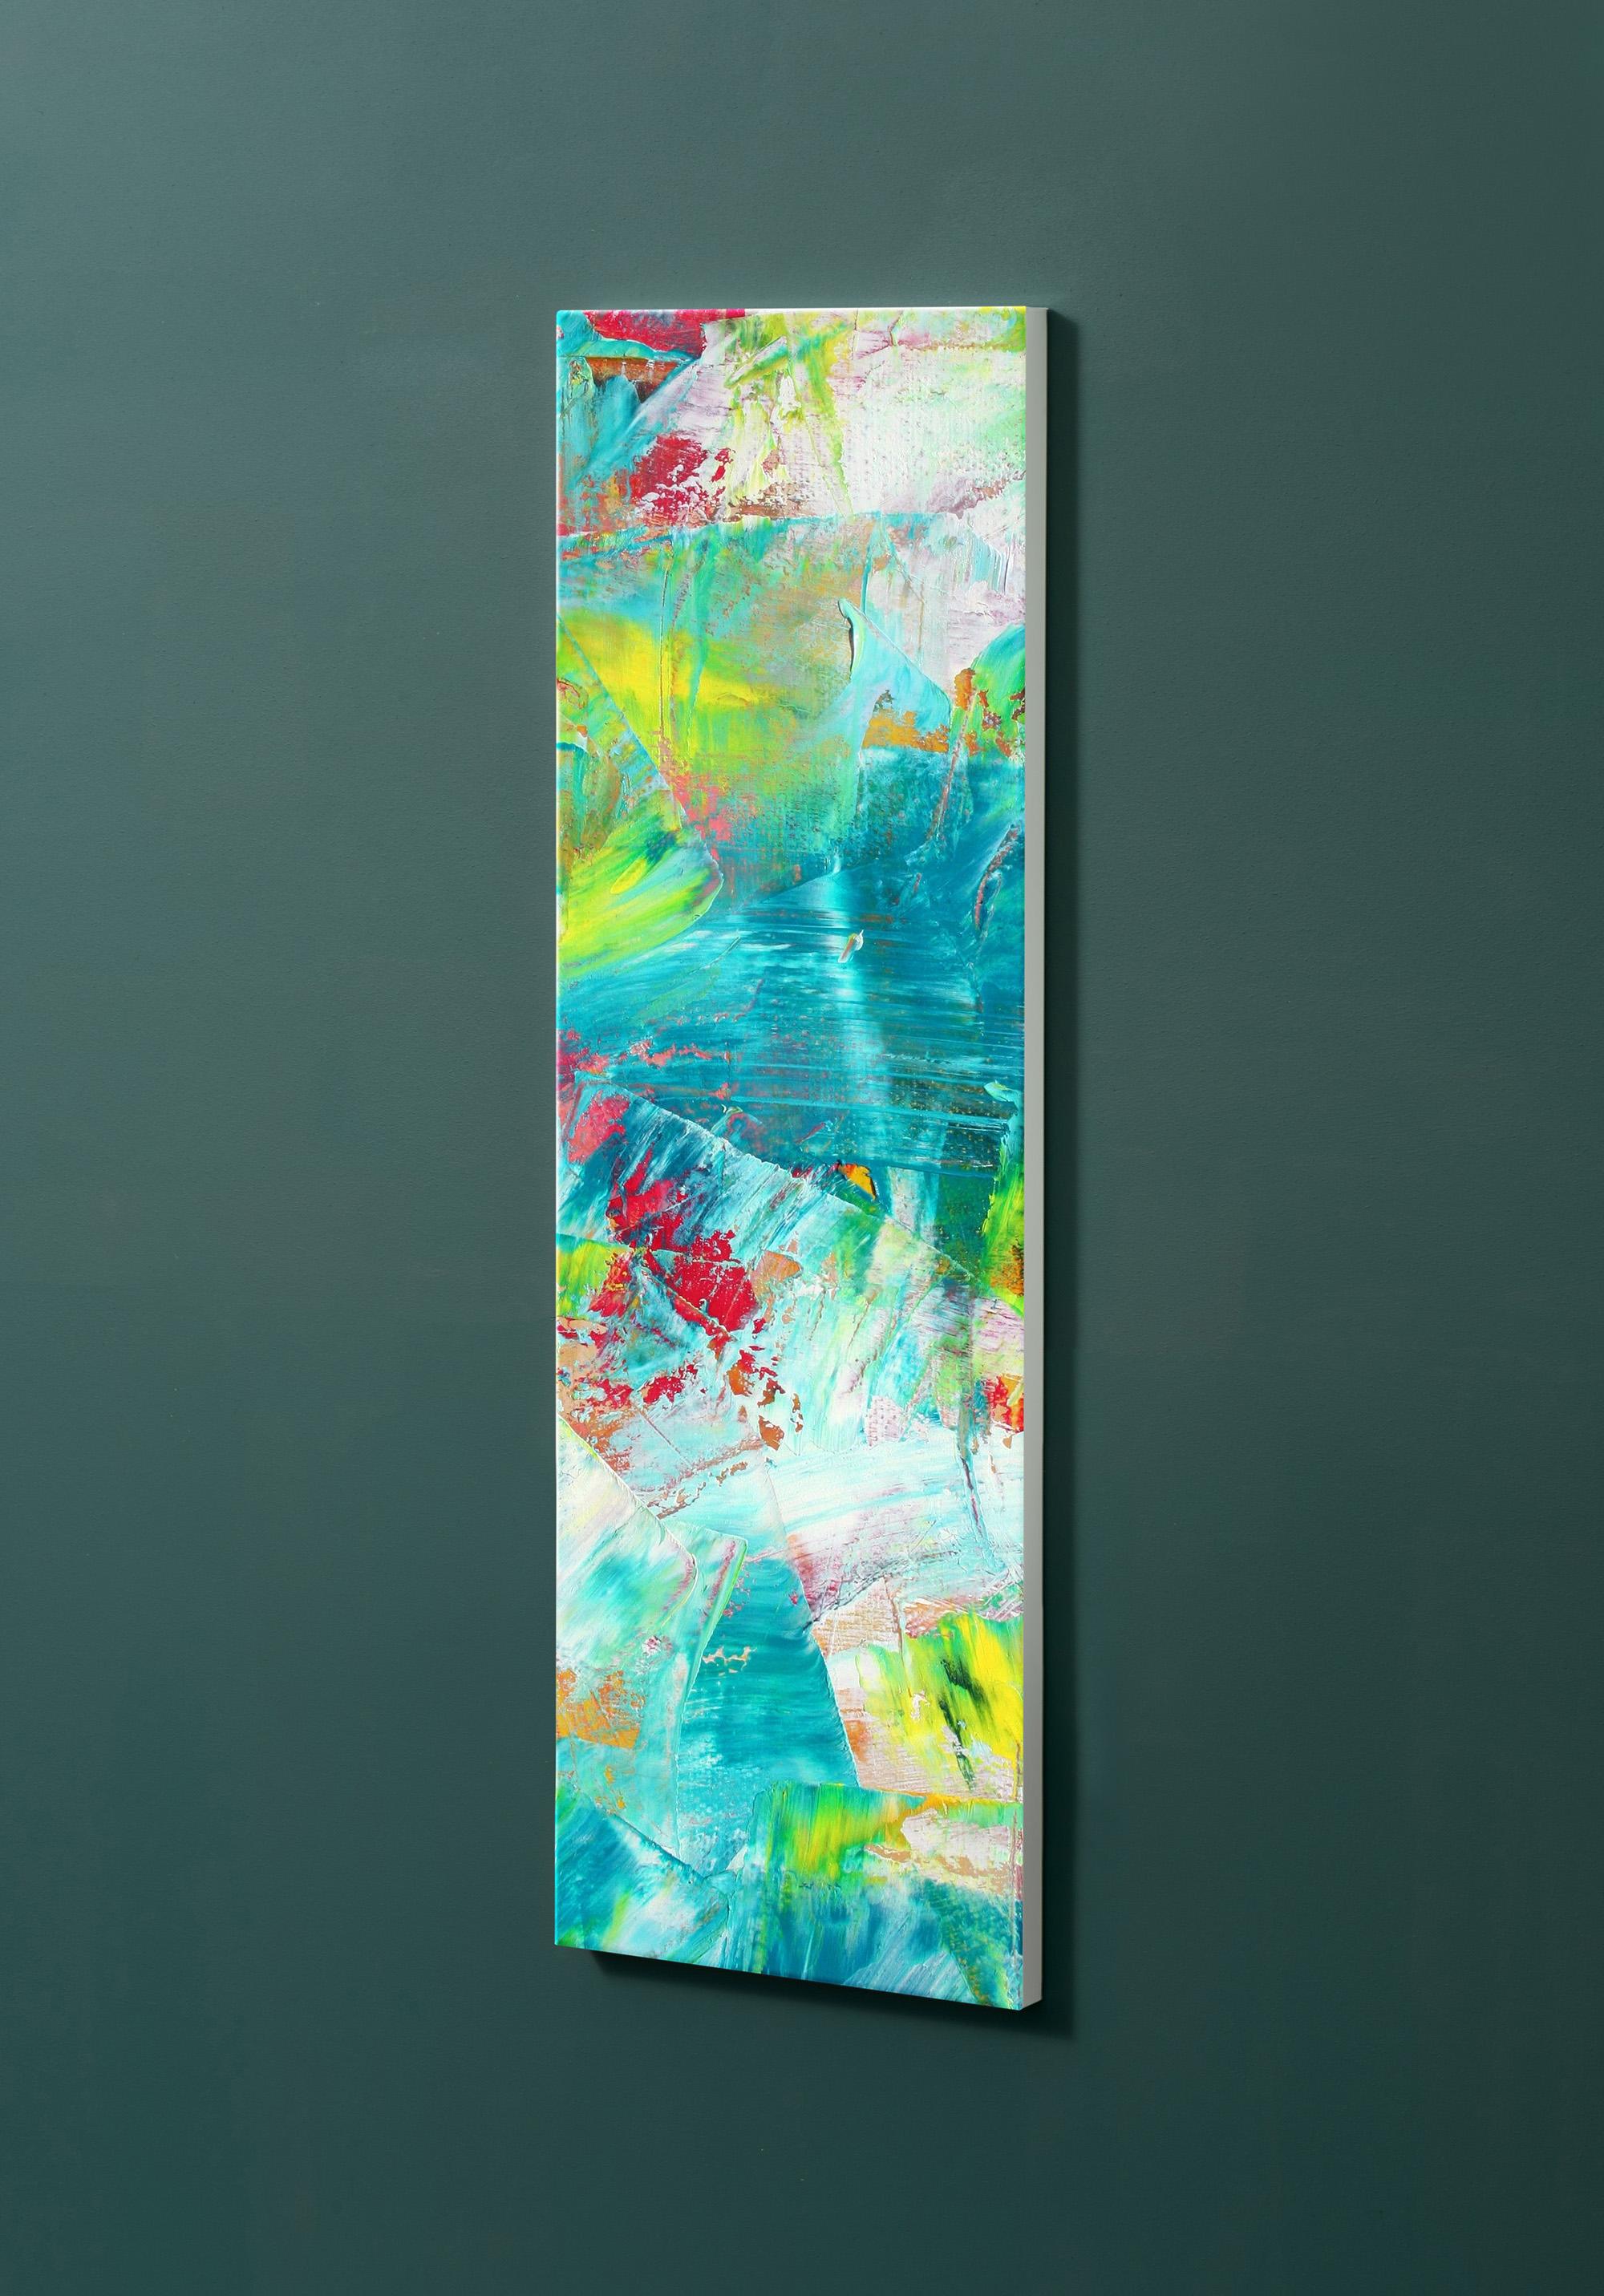 Magnettafel NOTIZ 30x90cm Motiv-Pinnwand M04 Abstrakt Kunst